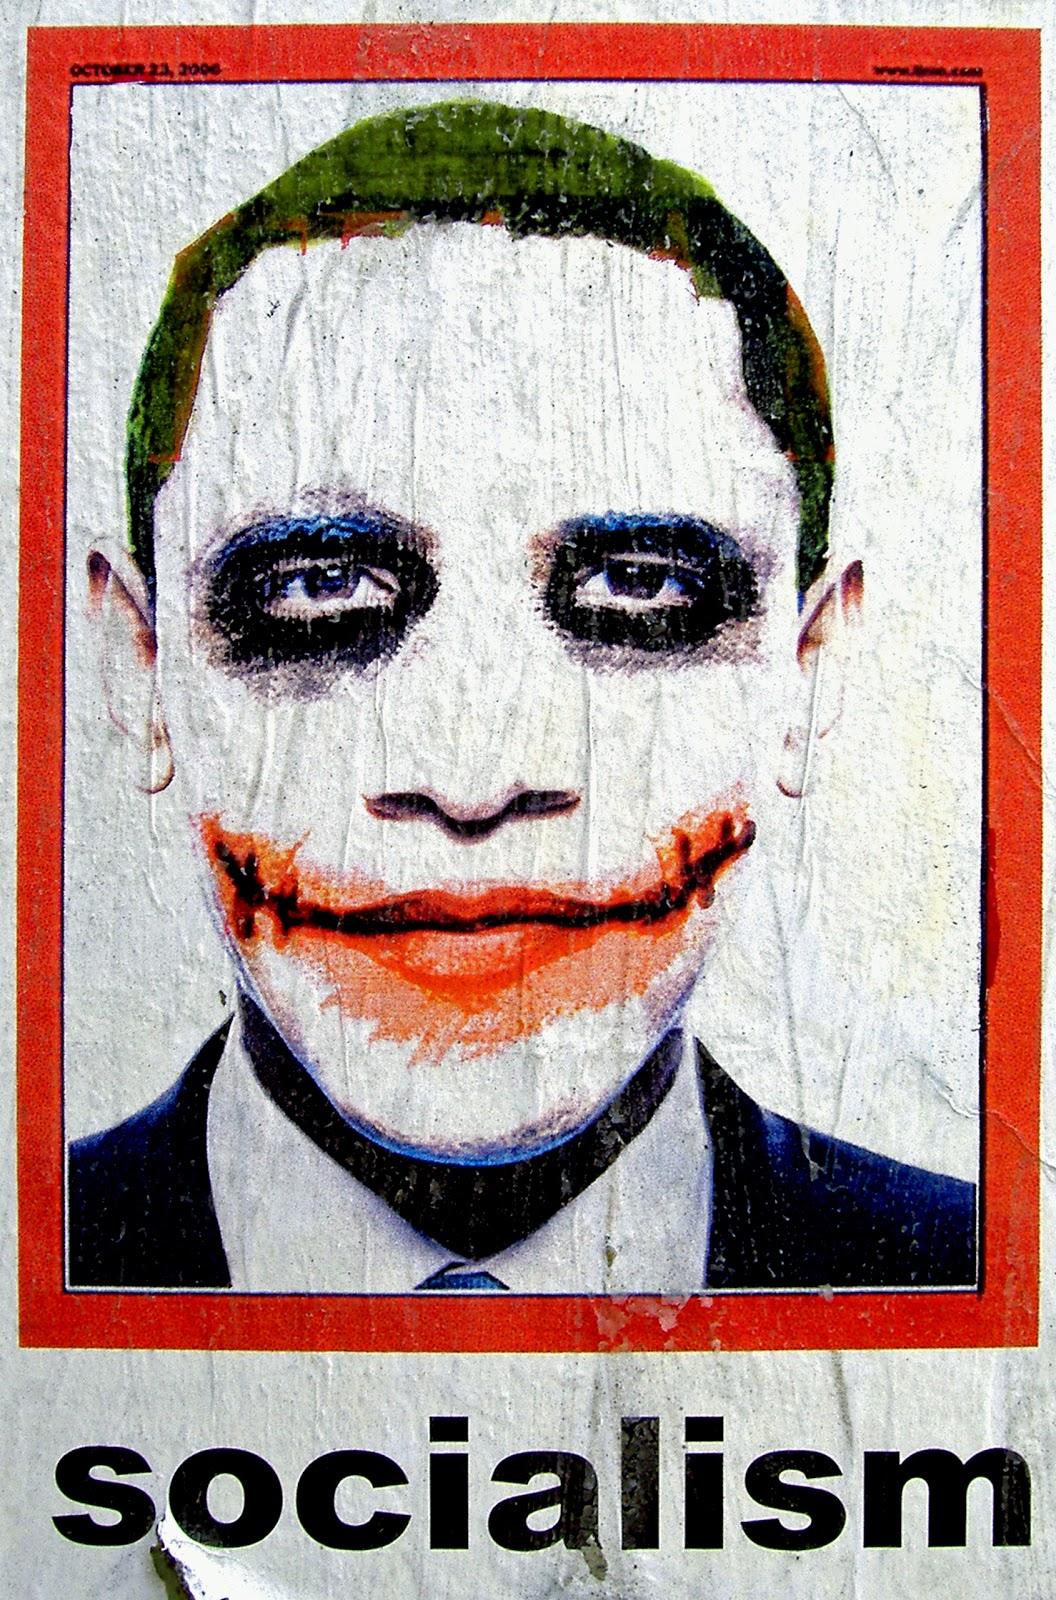 http://2.bp.blogspot.com/-xYToN98a7mI/UCSY_soAlLI/AAAAAAAAALg/kbUaS5fTmLs/s1600/obama-joker-face.jpg